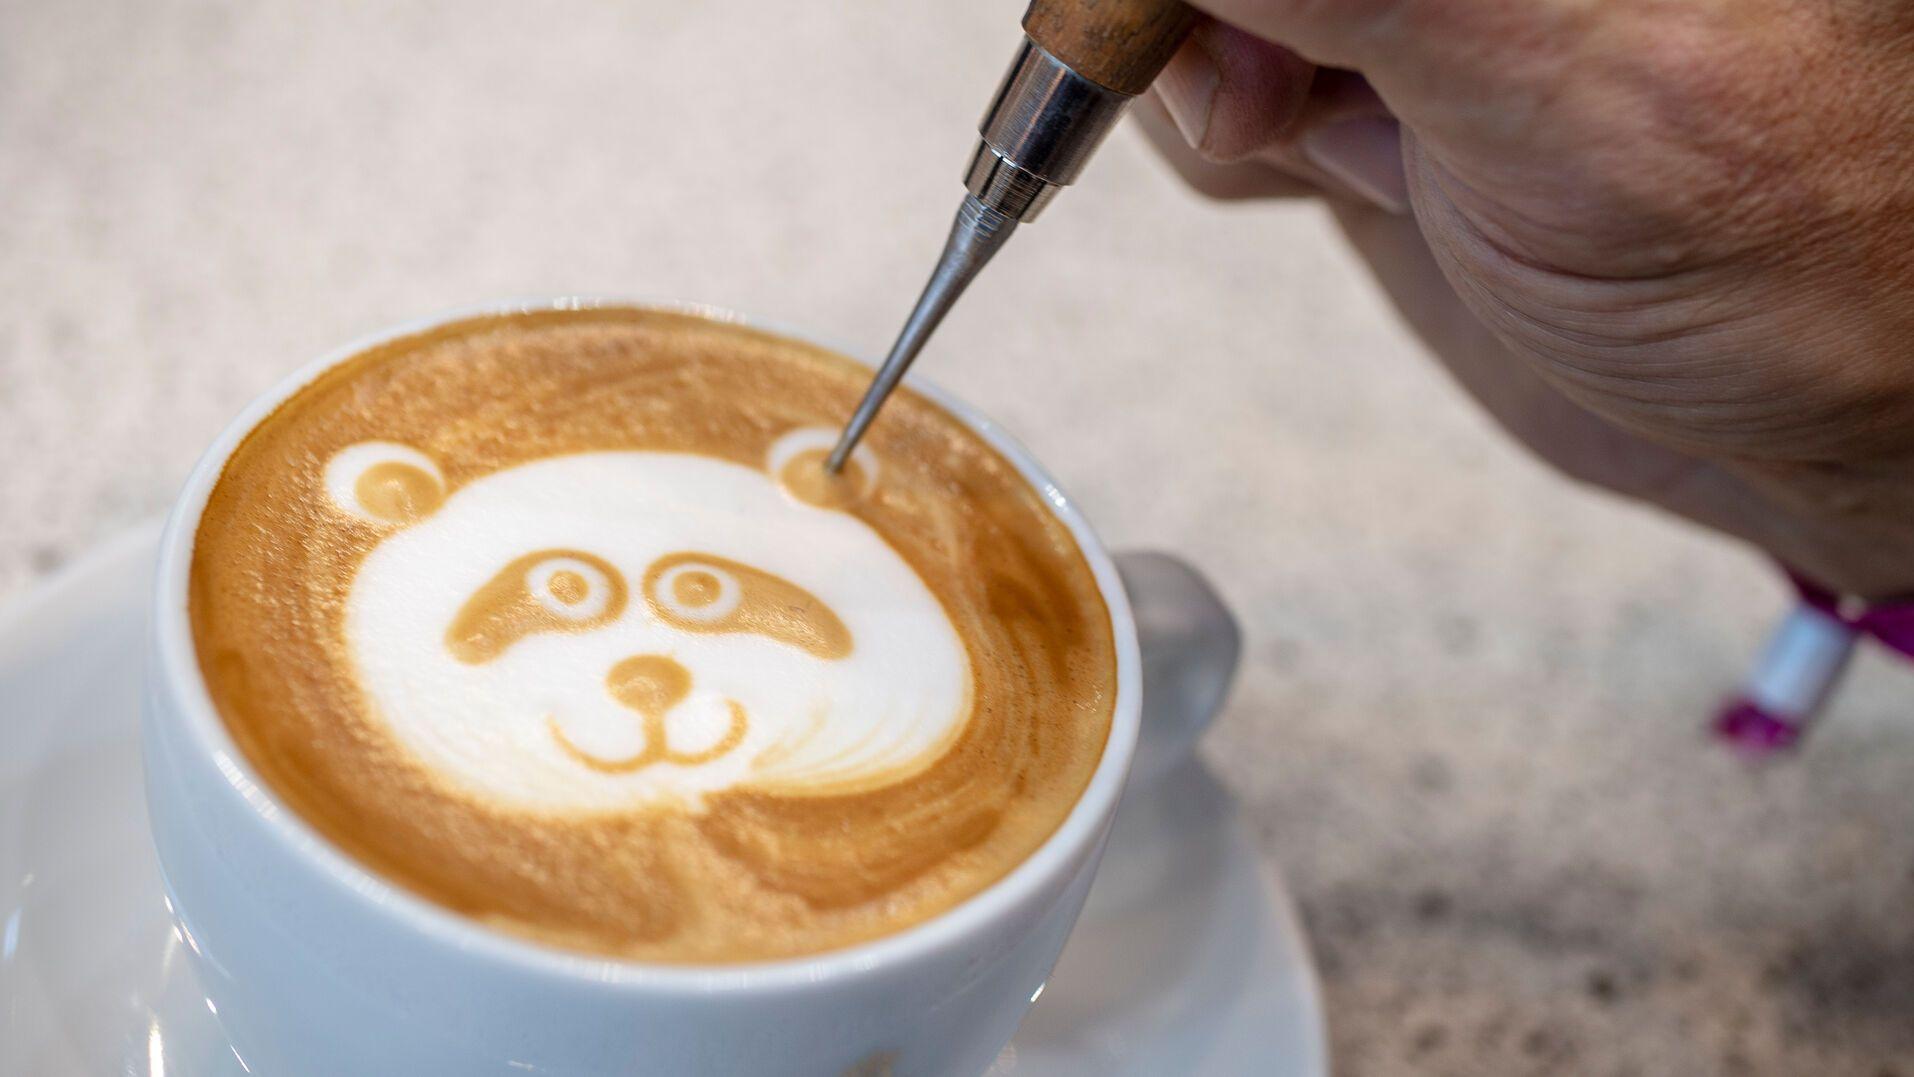 Kaffee mit Milchschaumbär-Muster.